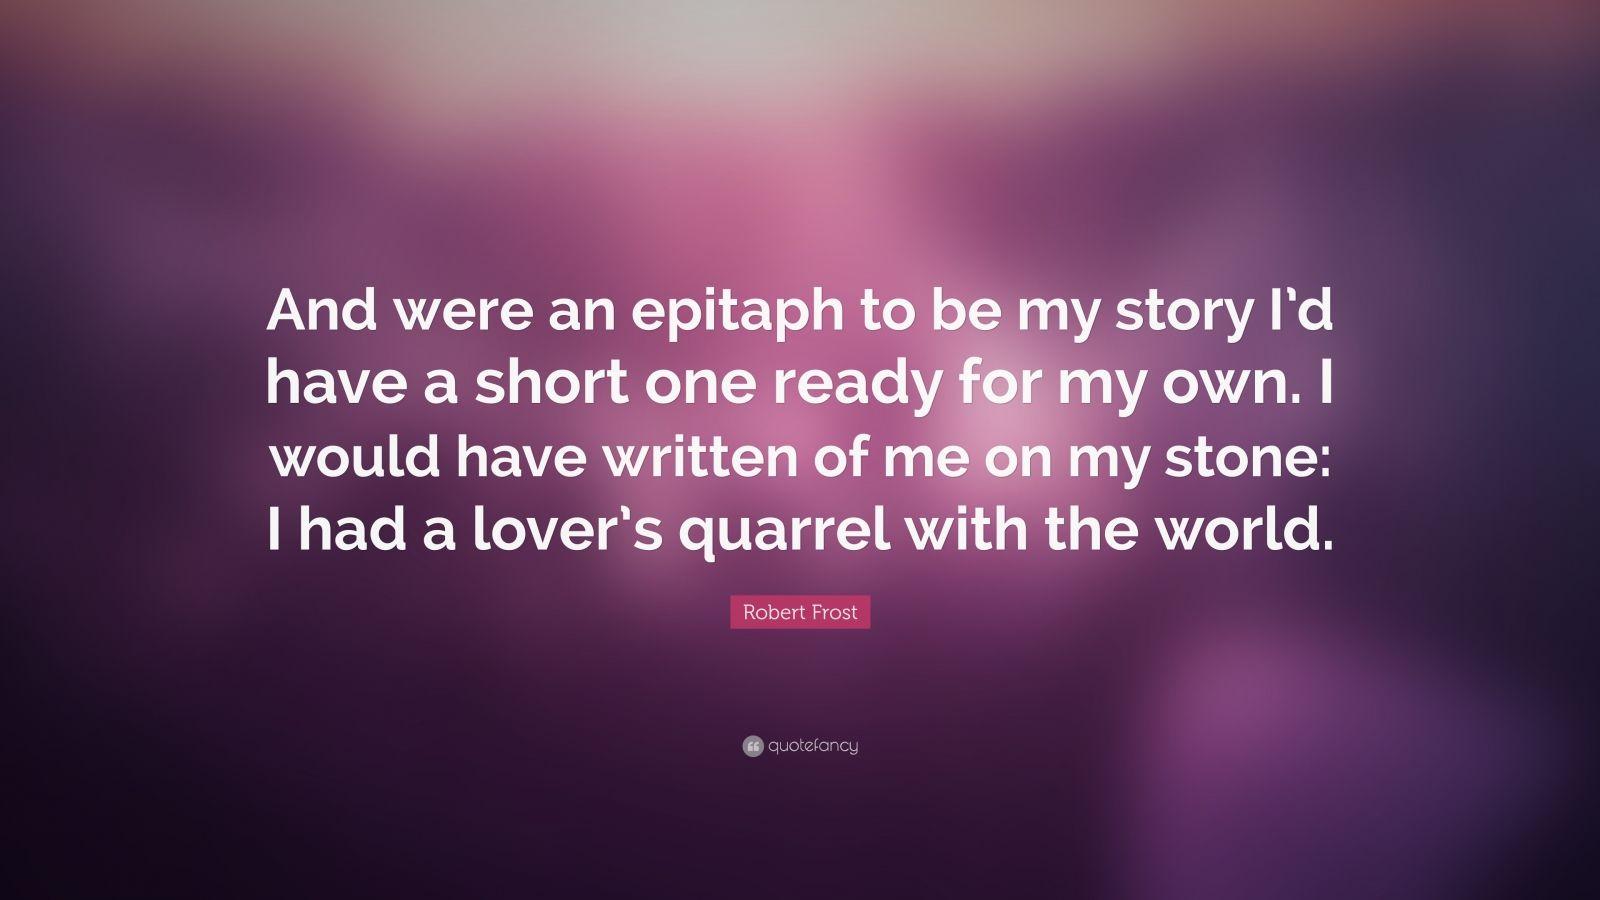 My story d